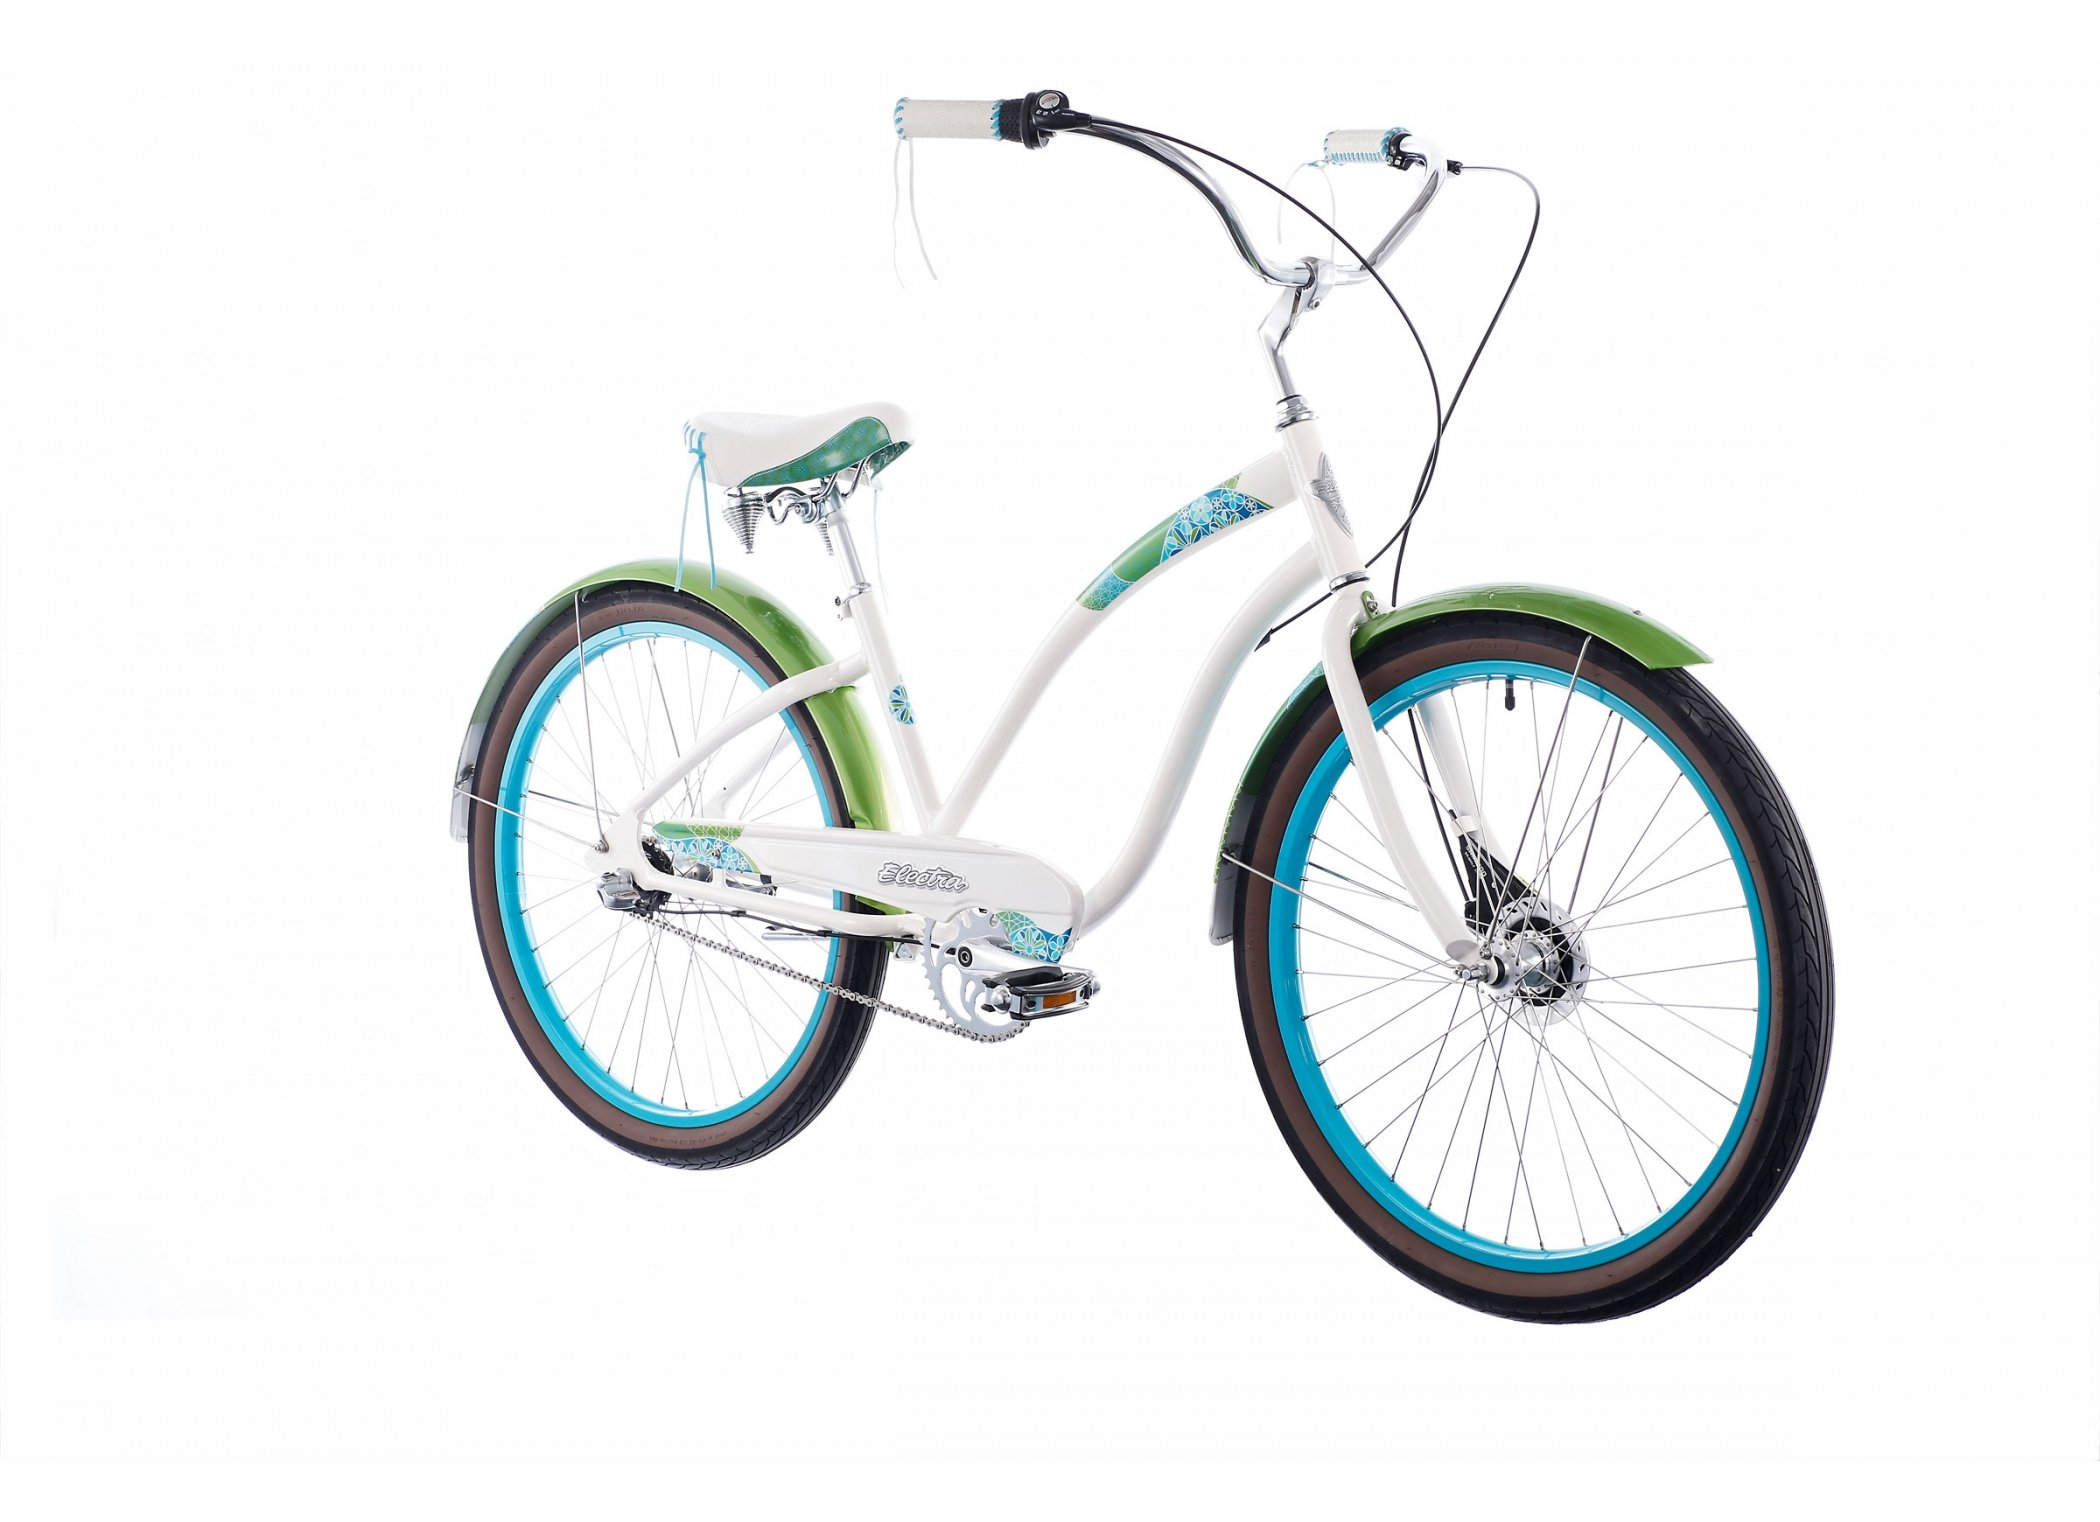 Bicicleta Cruiser Electra Bike Cirque 3i blanco para mujer 2014 ...